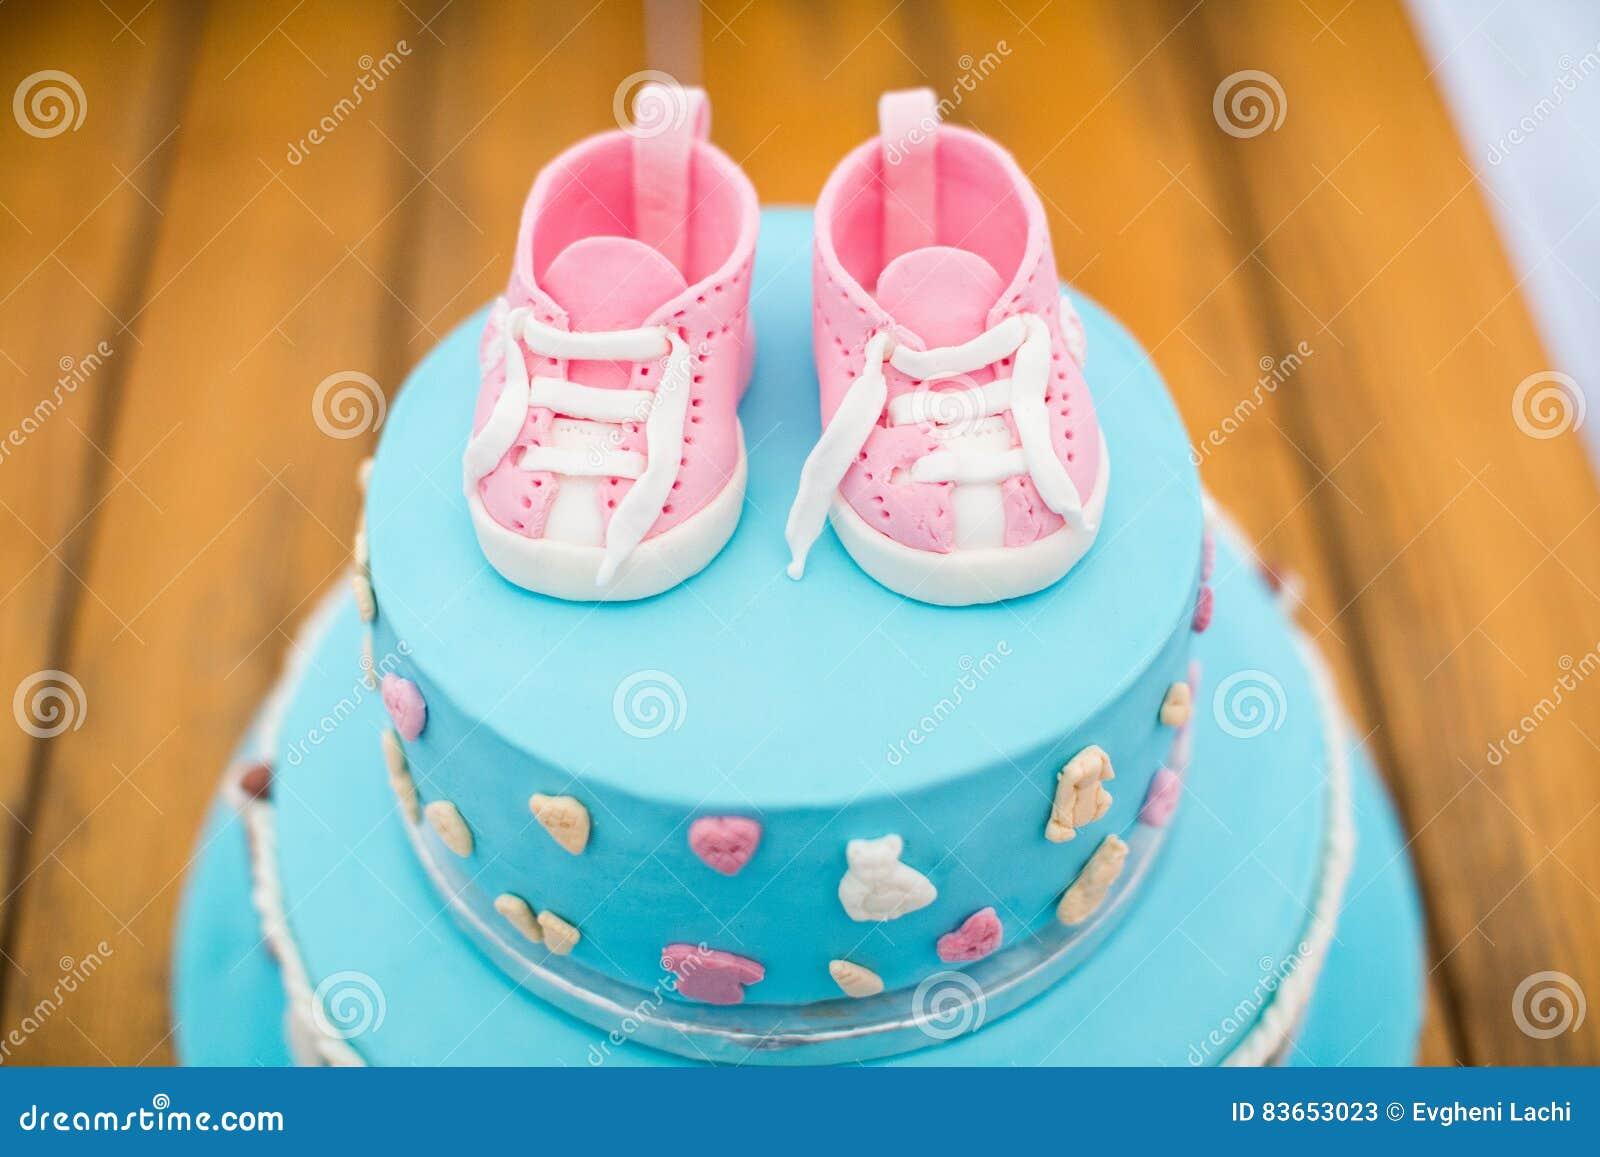 Child Birthday Cake Decorated For Kids Stock Photo Image 83653023